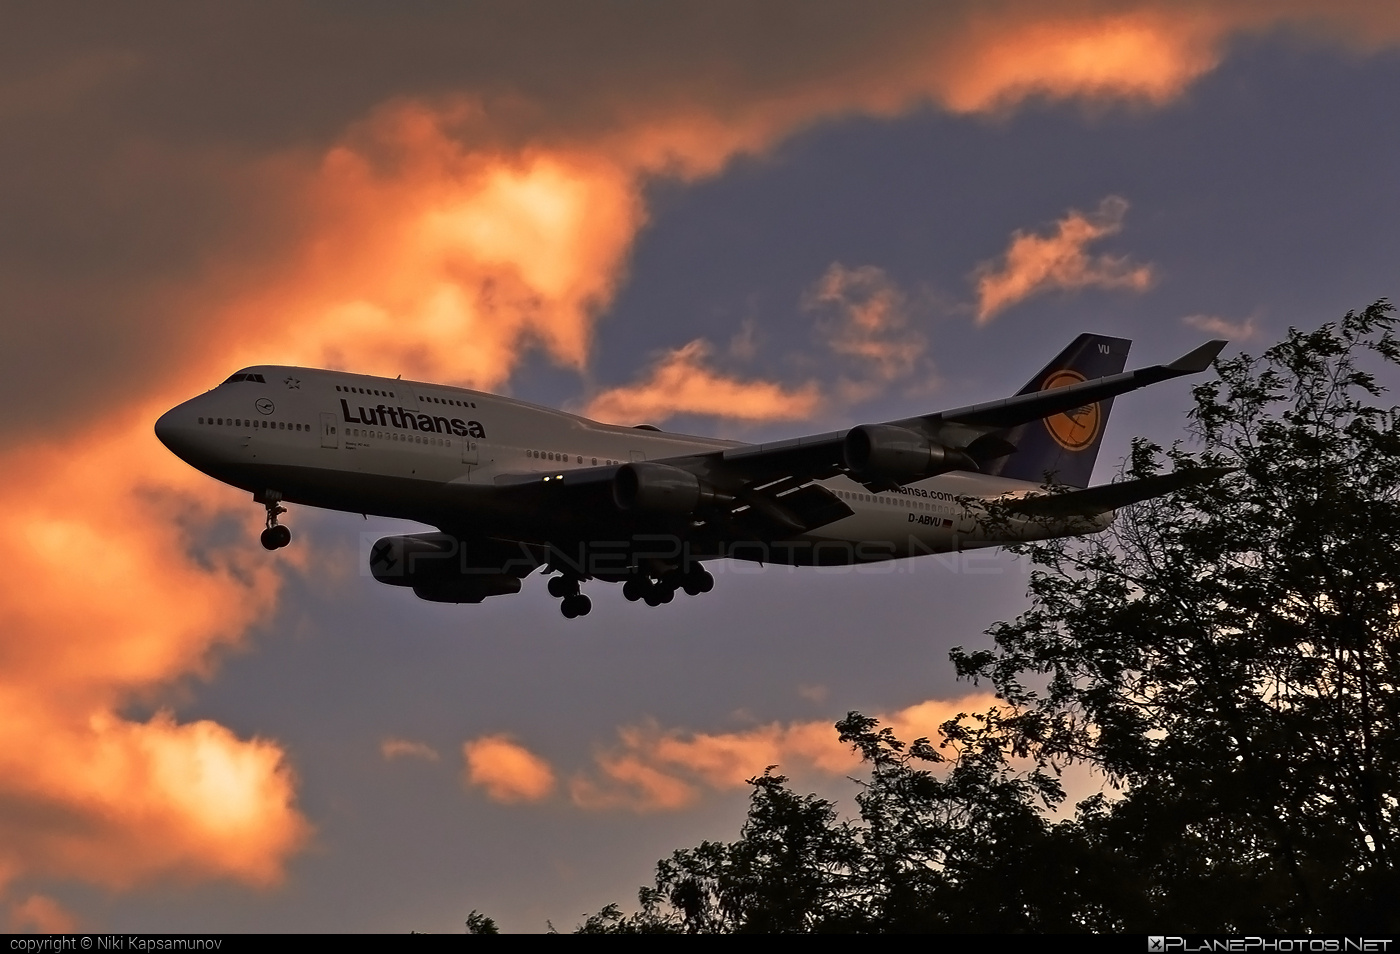 Boeing 747-400 - D-ABVU operated by Lufthansa #b747 #boeing #boeing747 #jumbo #lufthansa